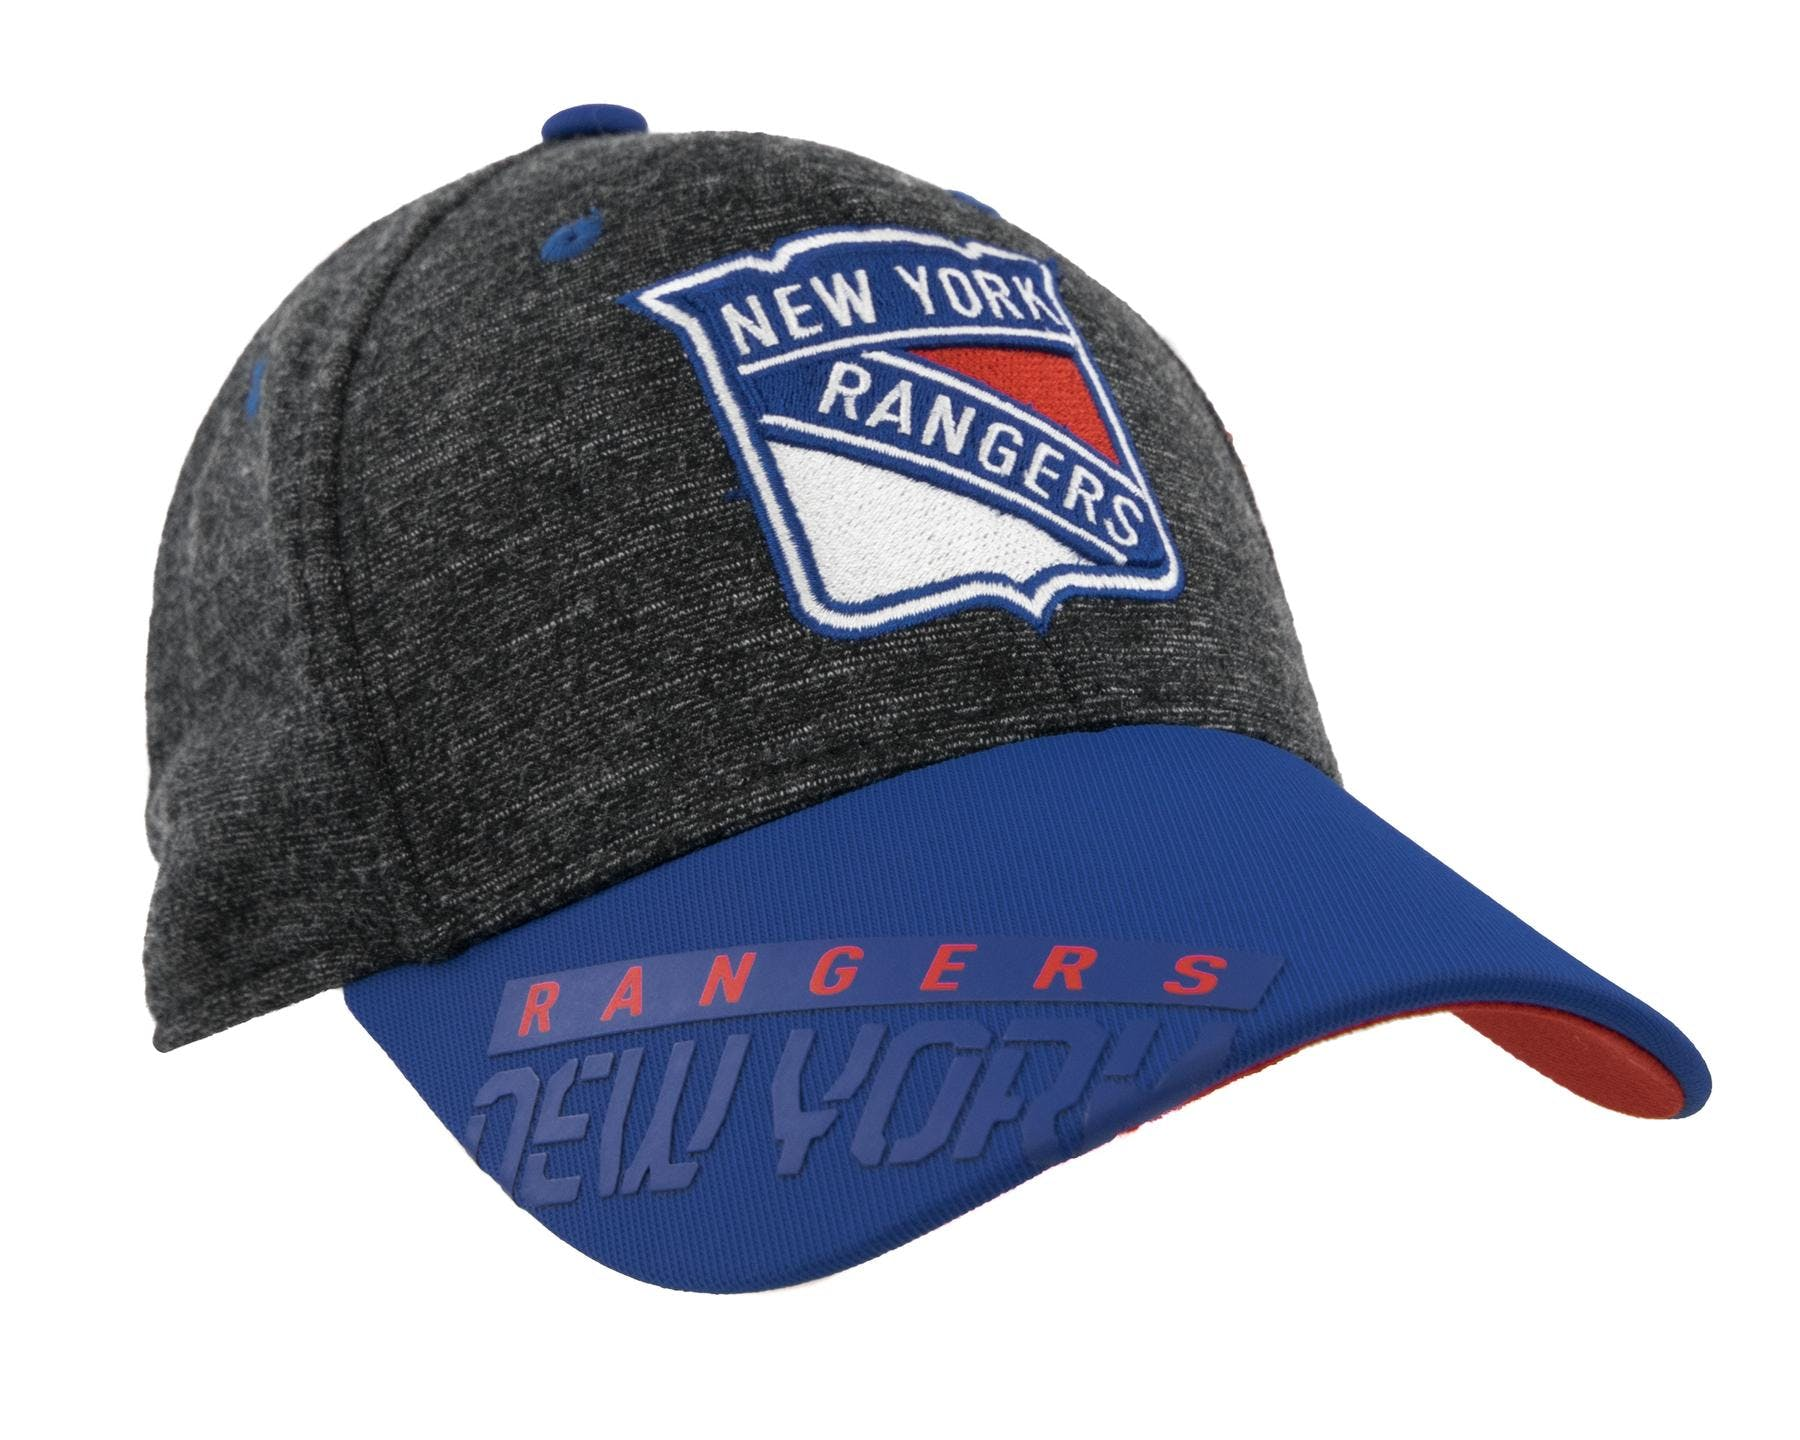 1e4aec48153 New York Rangers Reebok Gray Center Ice Playoff Structured Flex Fit ...